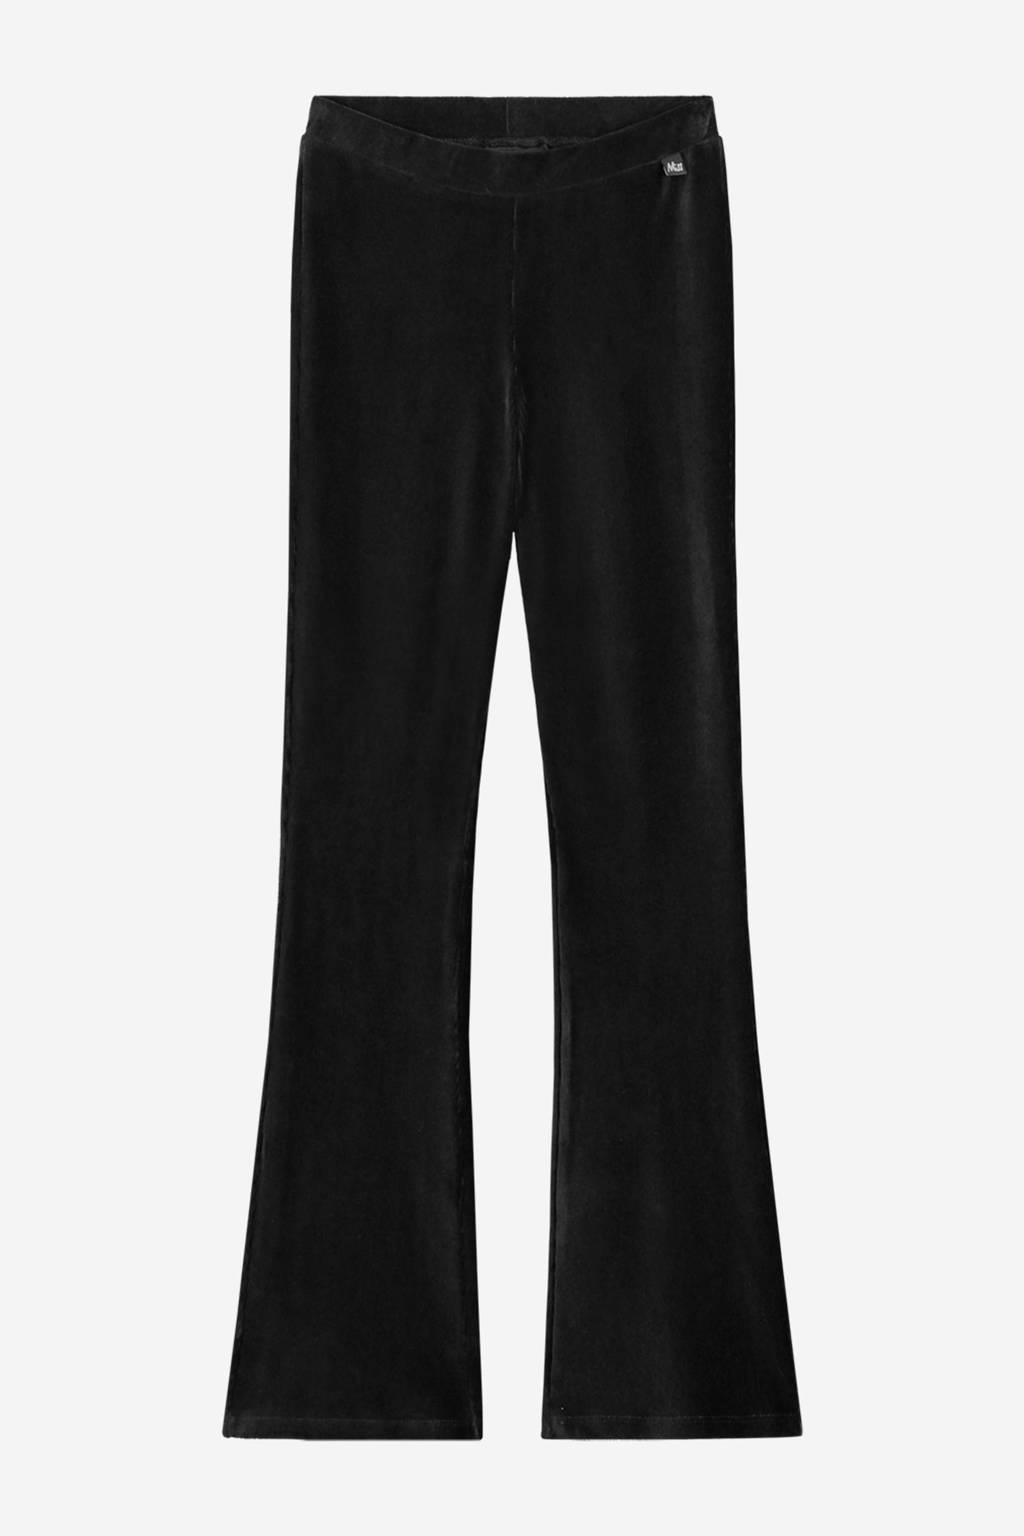 NIK&NIK fluwelen flared legging Farica zwart, Zwart